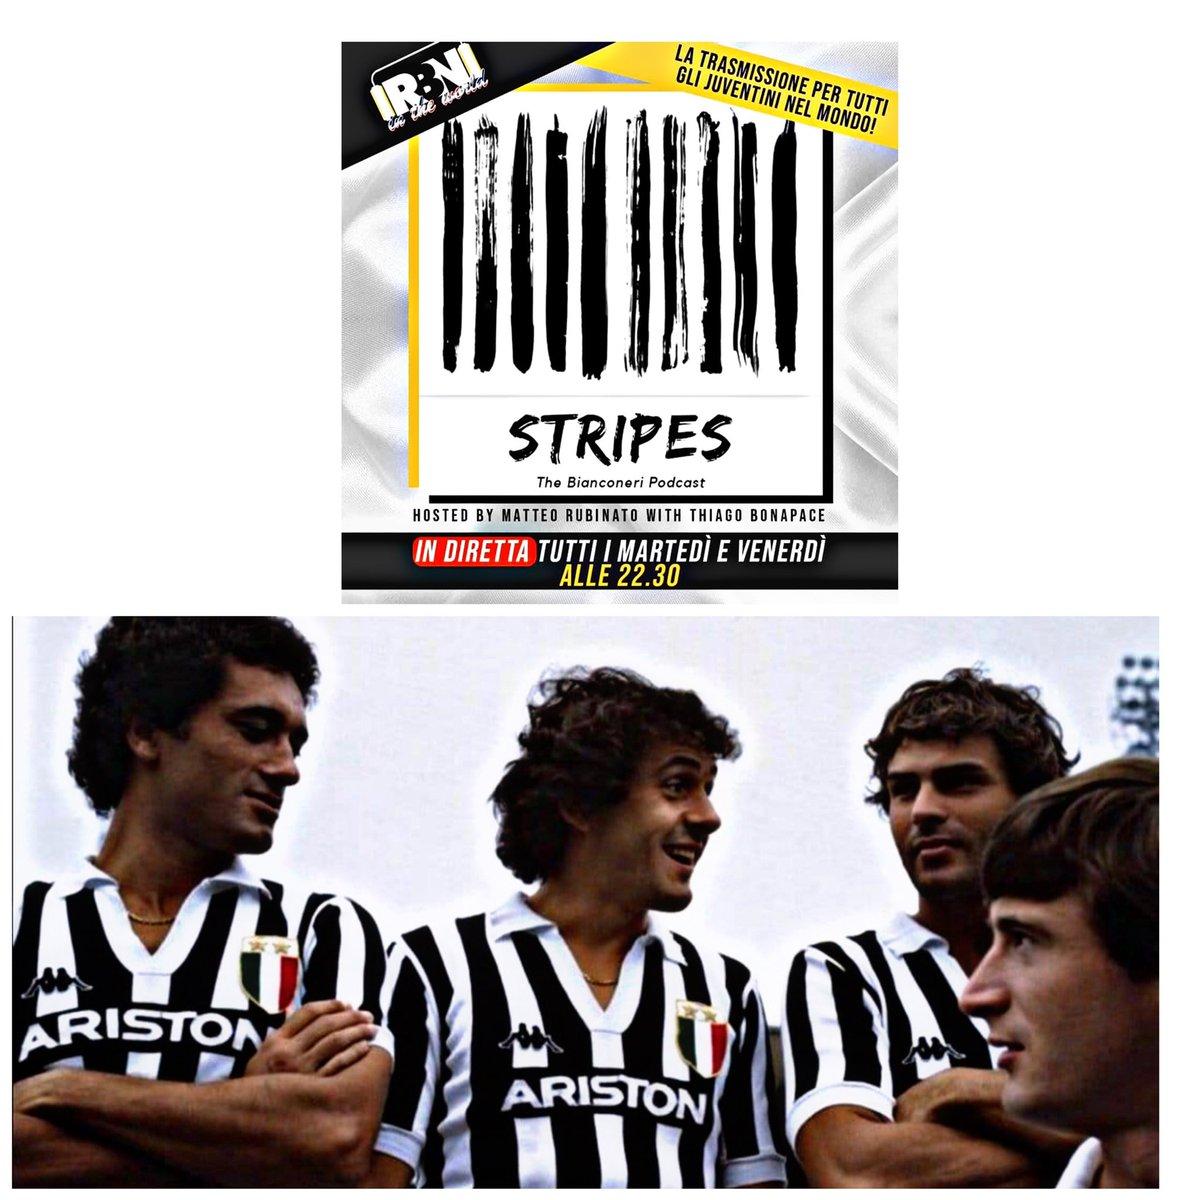 If u love Juventus u need to follow @thestripespodcast and u need to download the @radiobianconera app  #juve #juventus #finoallafine #finoallafineforzajuventus #forzajuve #forzajuventus #seriea #soccer #calcio #adp10 #CR7 #pirlo #jbworld #radiobianconera https://t.co/IlTXUj9uf8